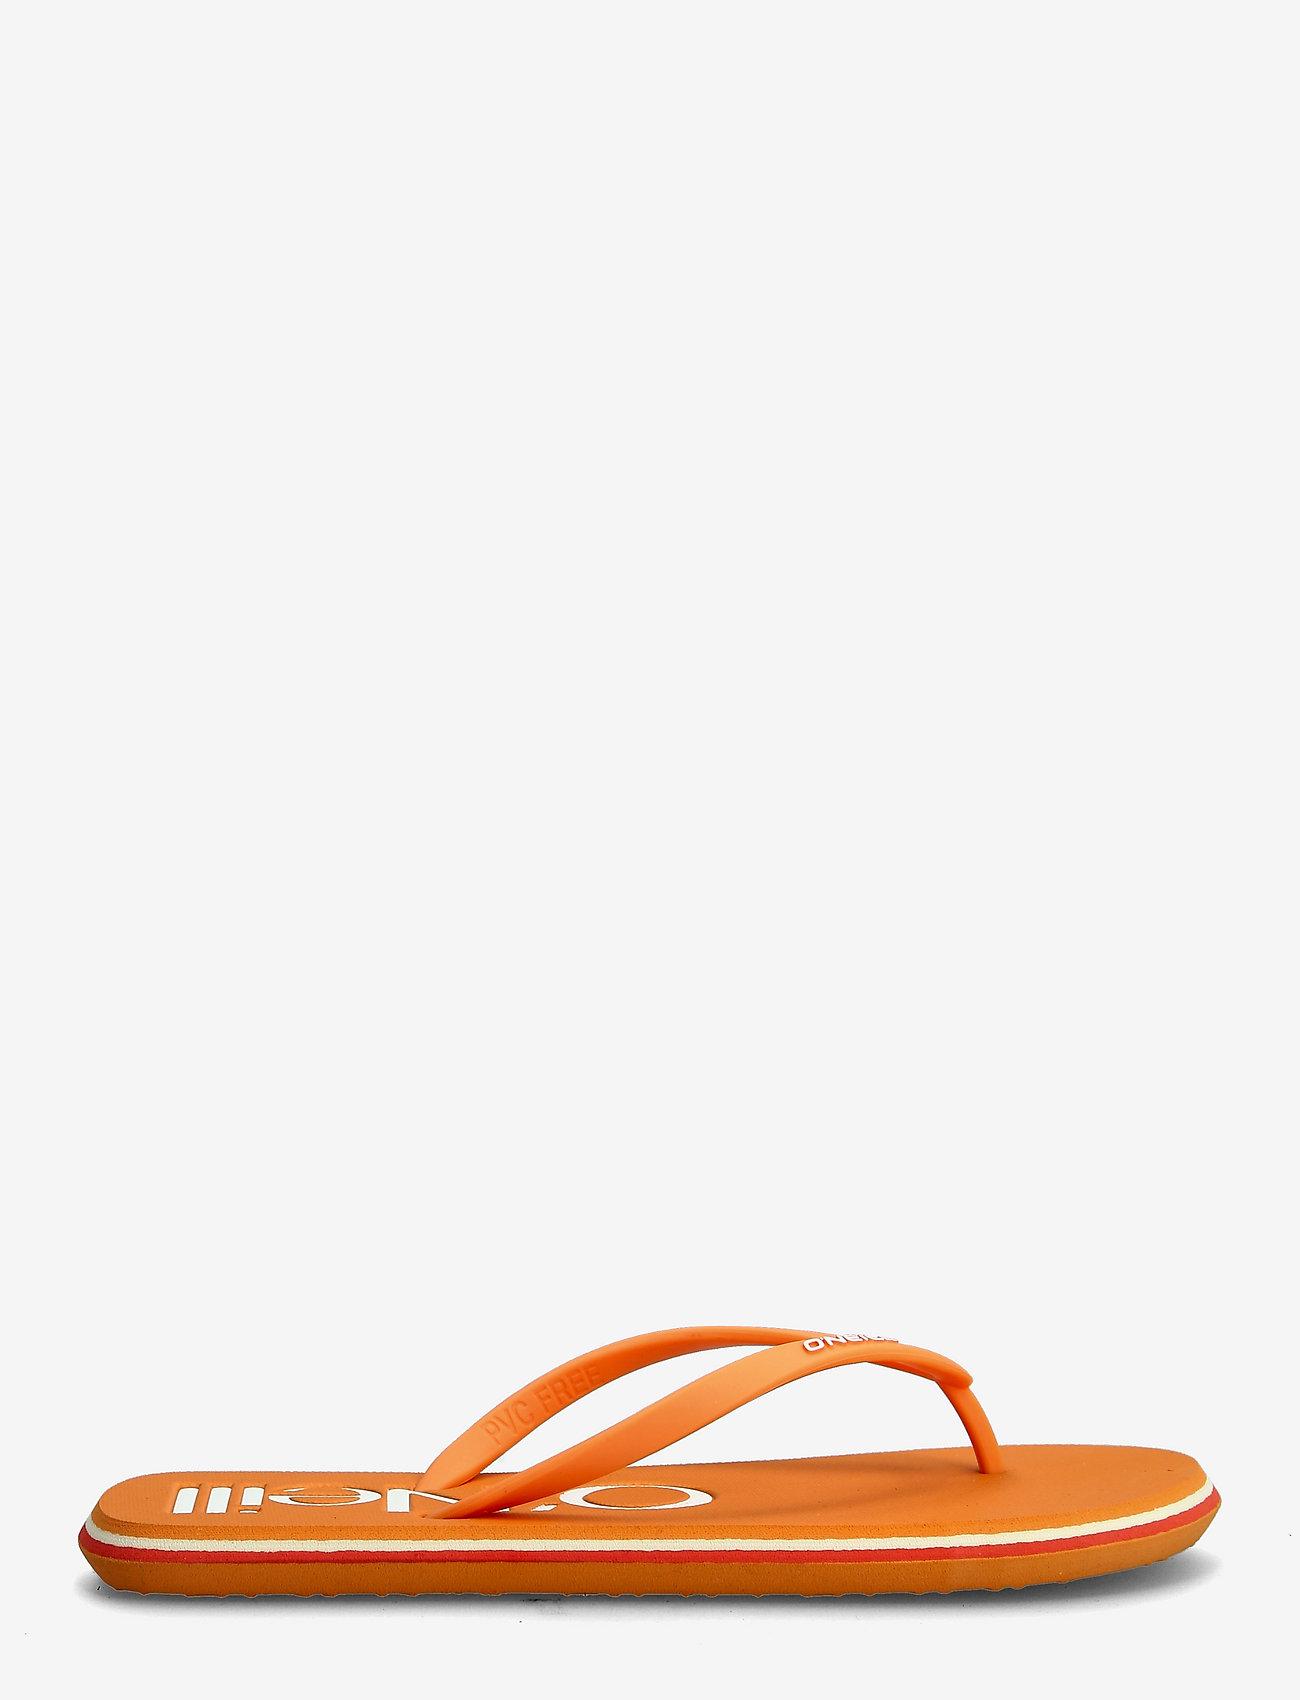 O'neill - FW PROFILE LOGO SANDALS - sko - papaya - 1